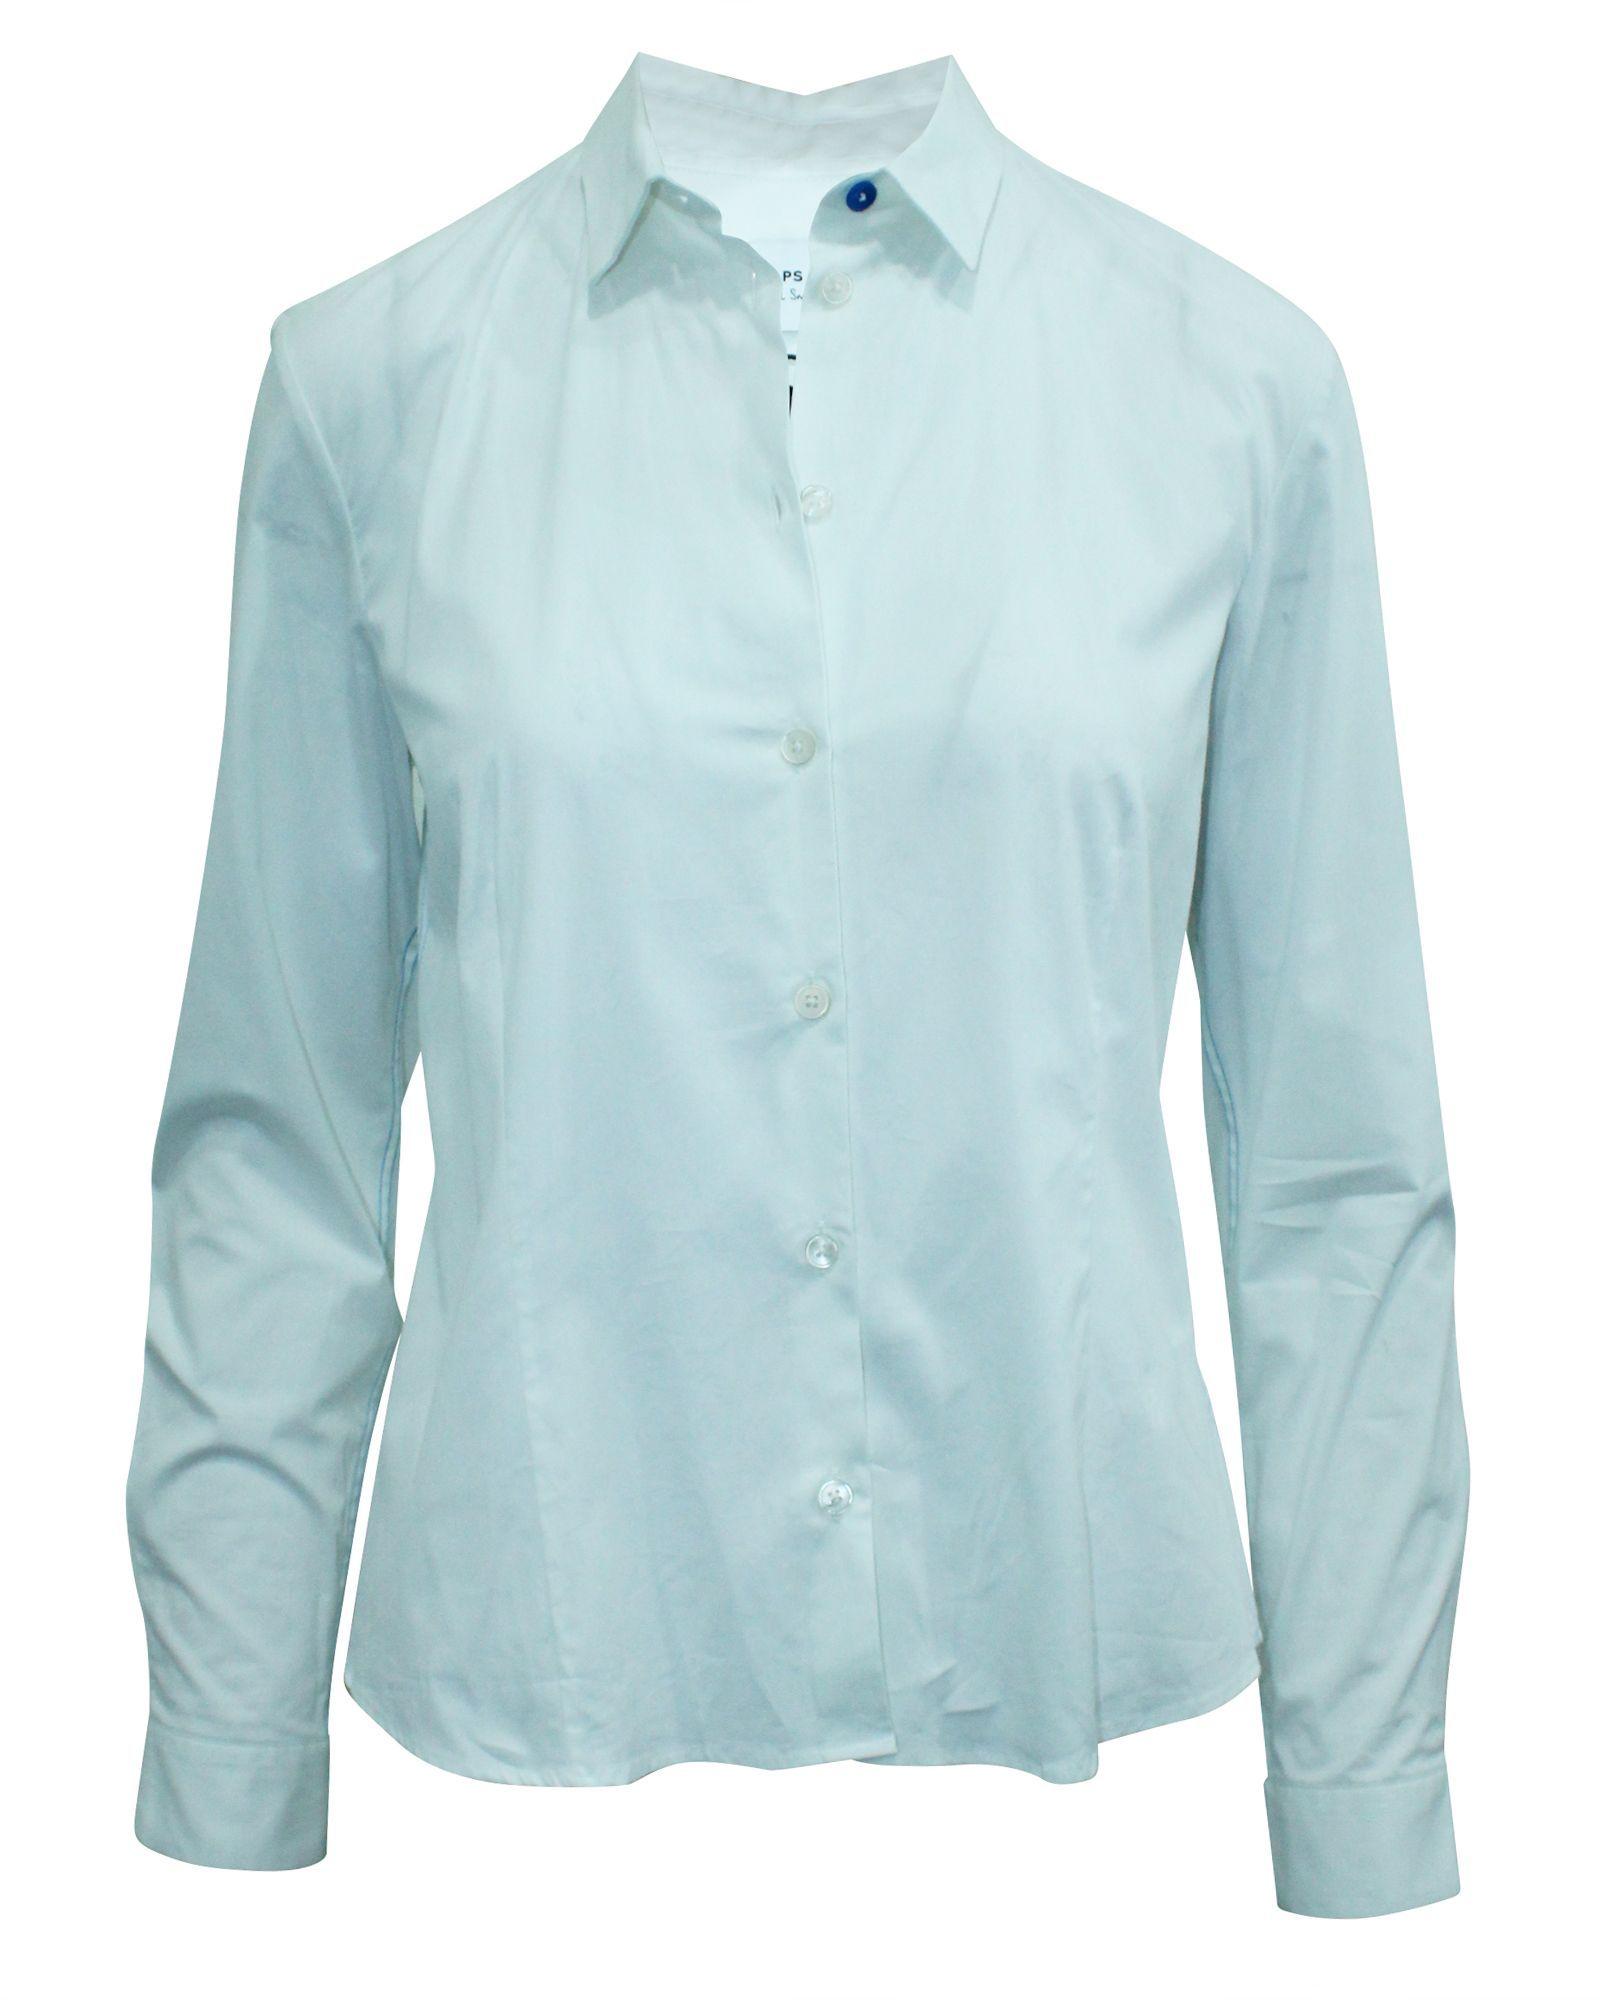 Paul Smith White Shirt